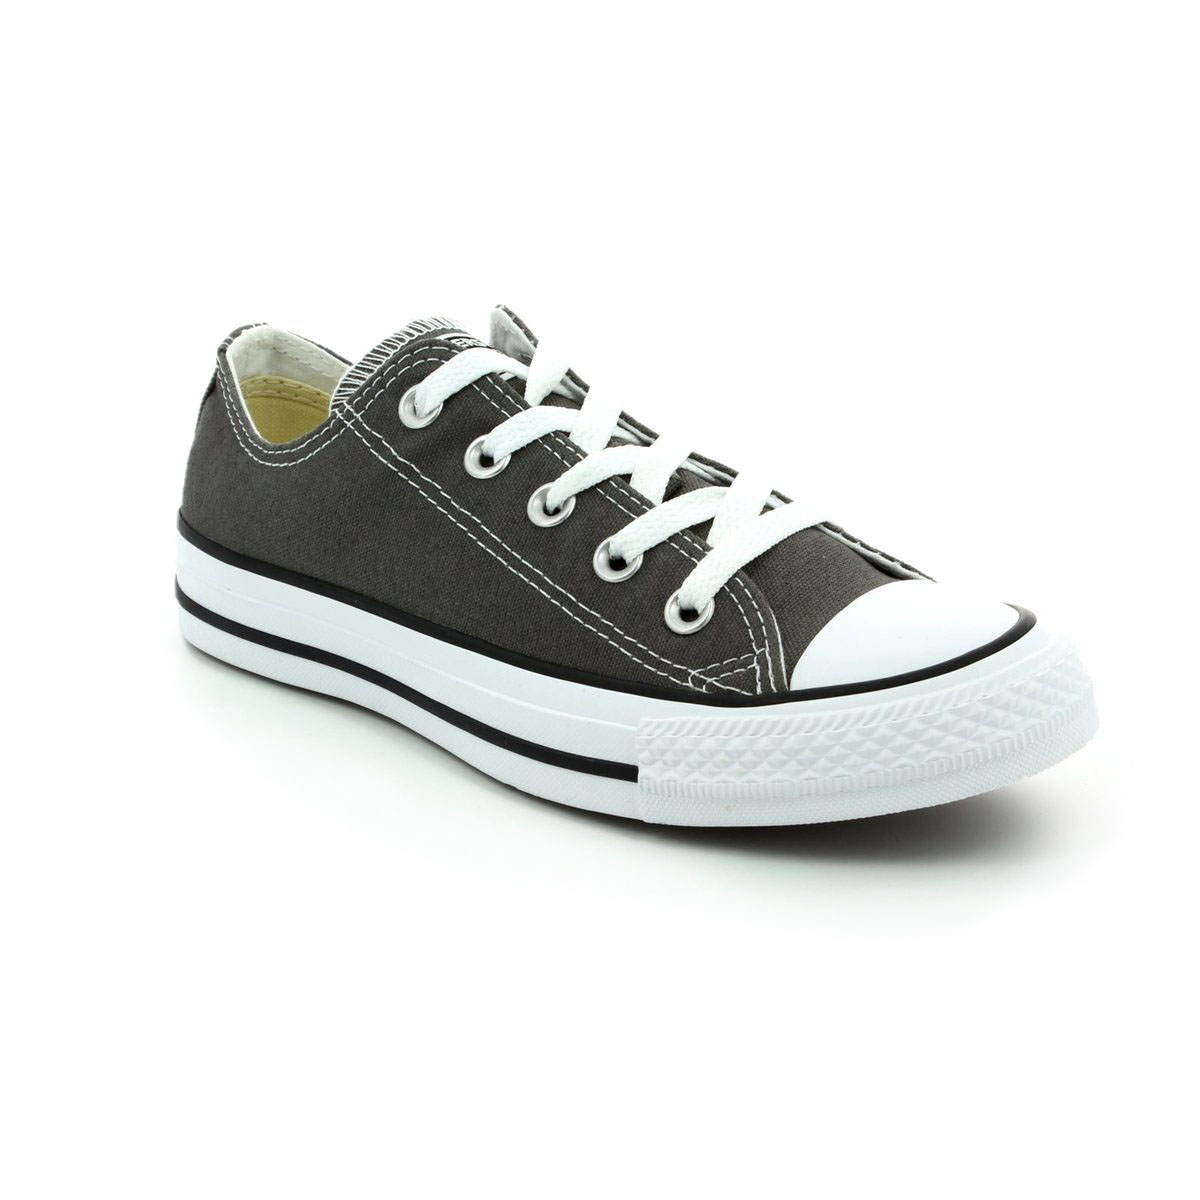 Converse All Star Ox Charcoal 1J794C (Dark Grey)